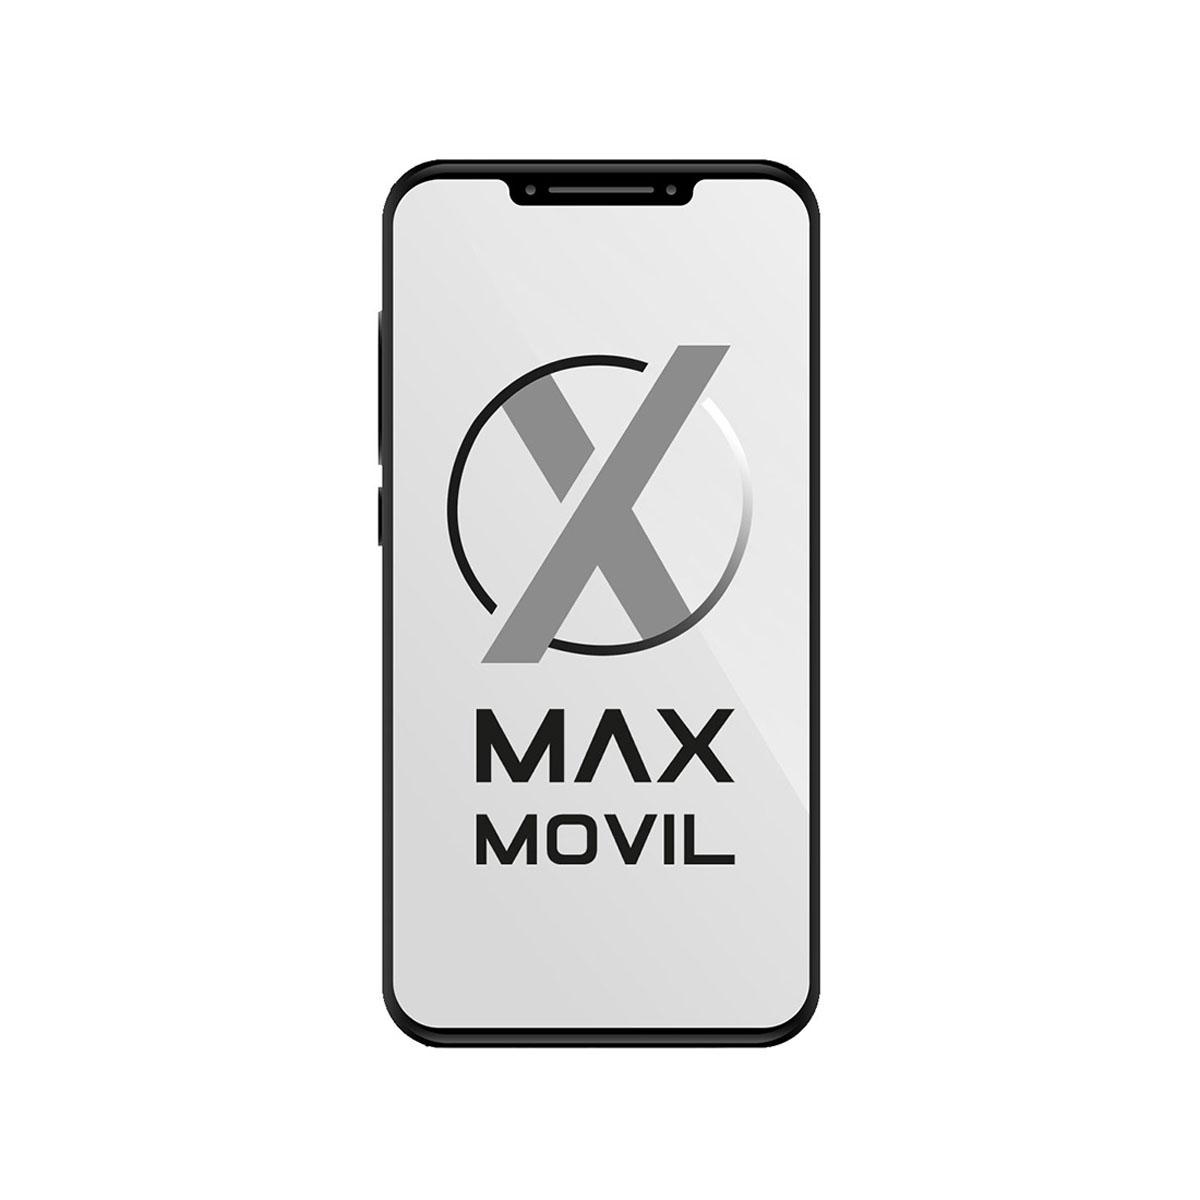 Telefono movil Iphone 6 16gb oro CPO ECO-RECICLADO GRADO A